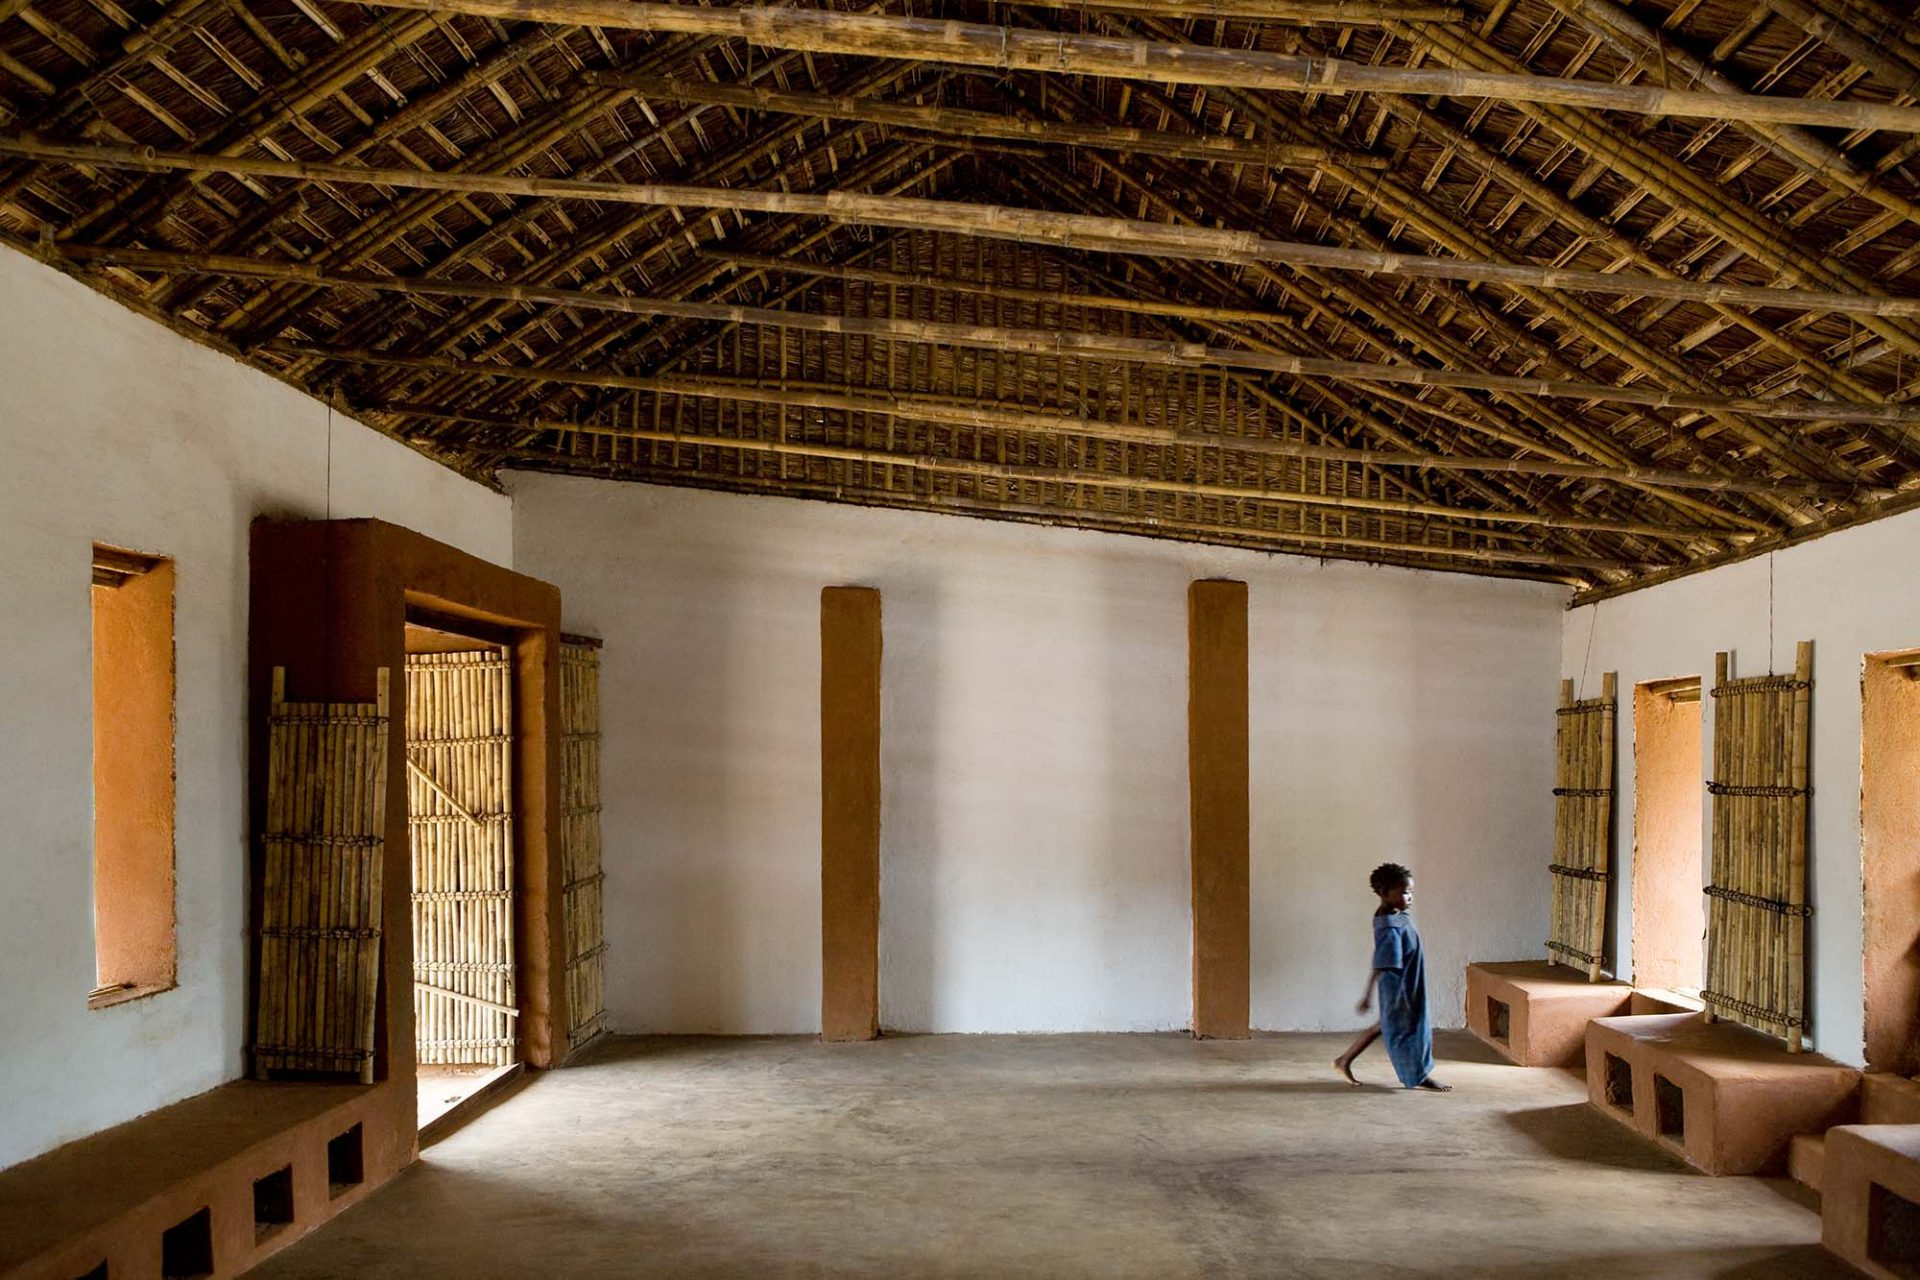 Habitat Initiative Cabo Delgado, Mosambik. Innenansicht B24 Pilotprojekt 25 de Junho. Auftraggeber und Träger des Projektes Aga Khan Foundation (AKF), Fertigstellung der 11 Schulen: Dezember 2010.